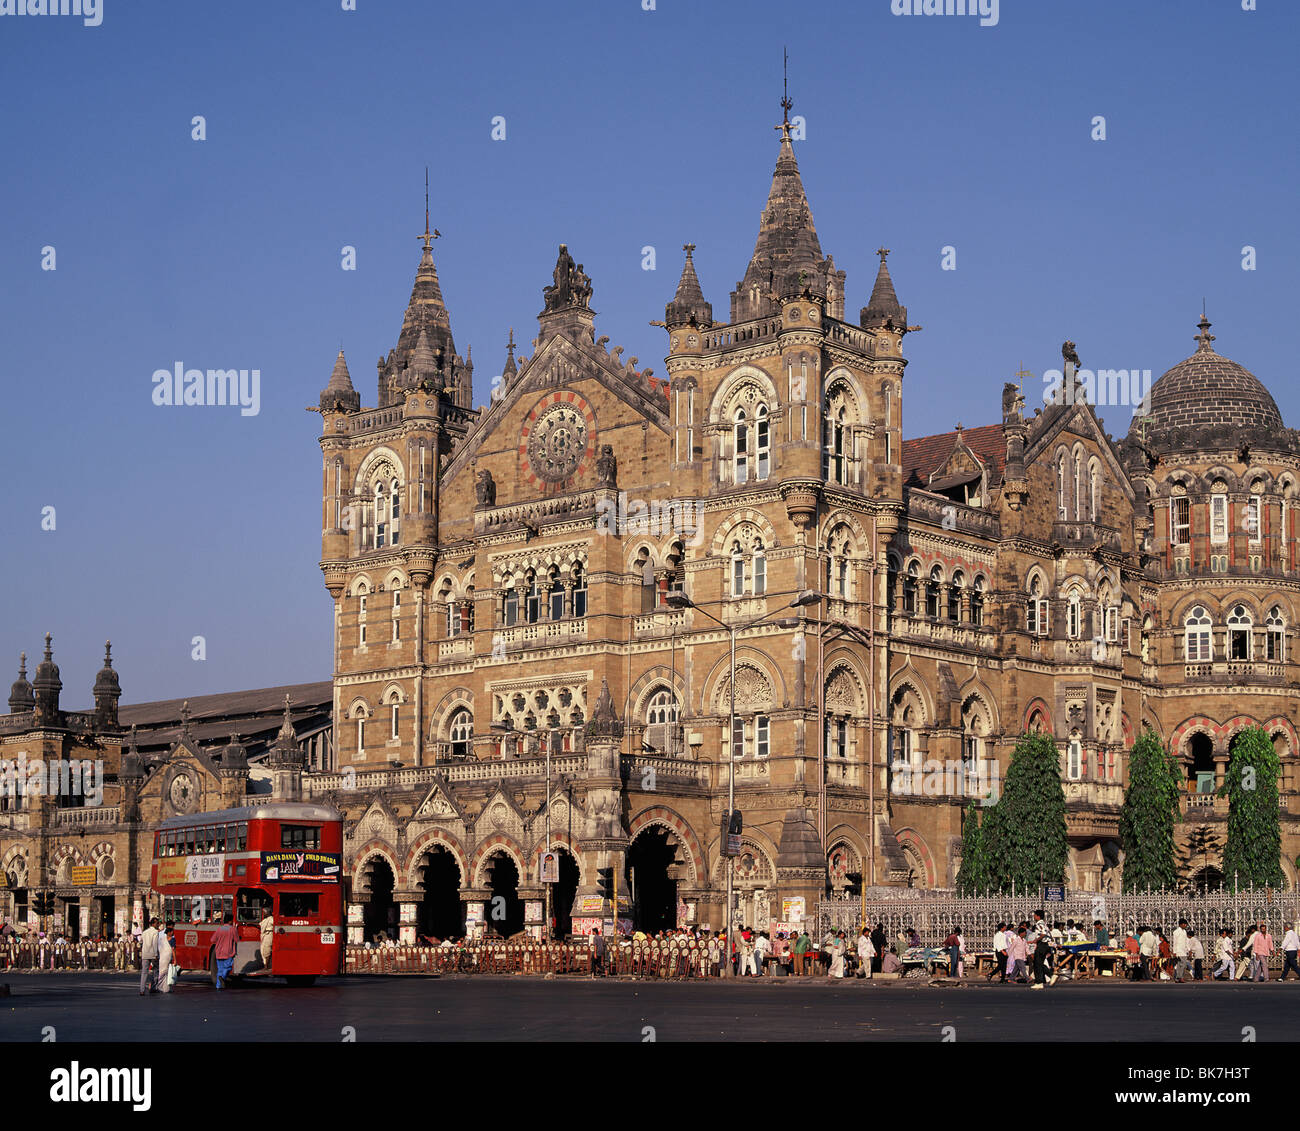 Mumbai Railway Station (Victoria Terminus) (Chhatrapati Shivaji), UNESCO World Heritage Site, India, Asia - Stock Image